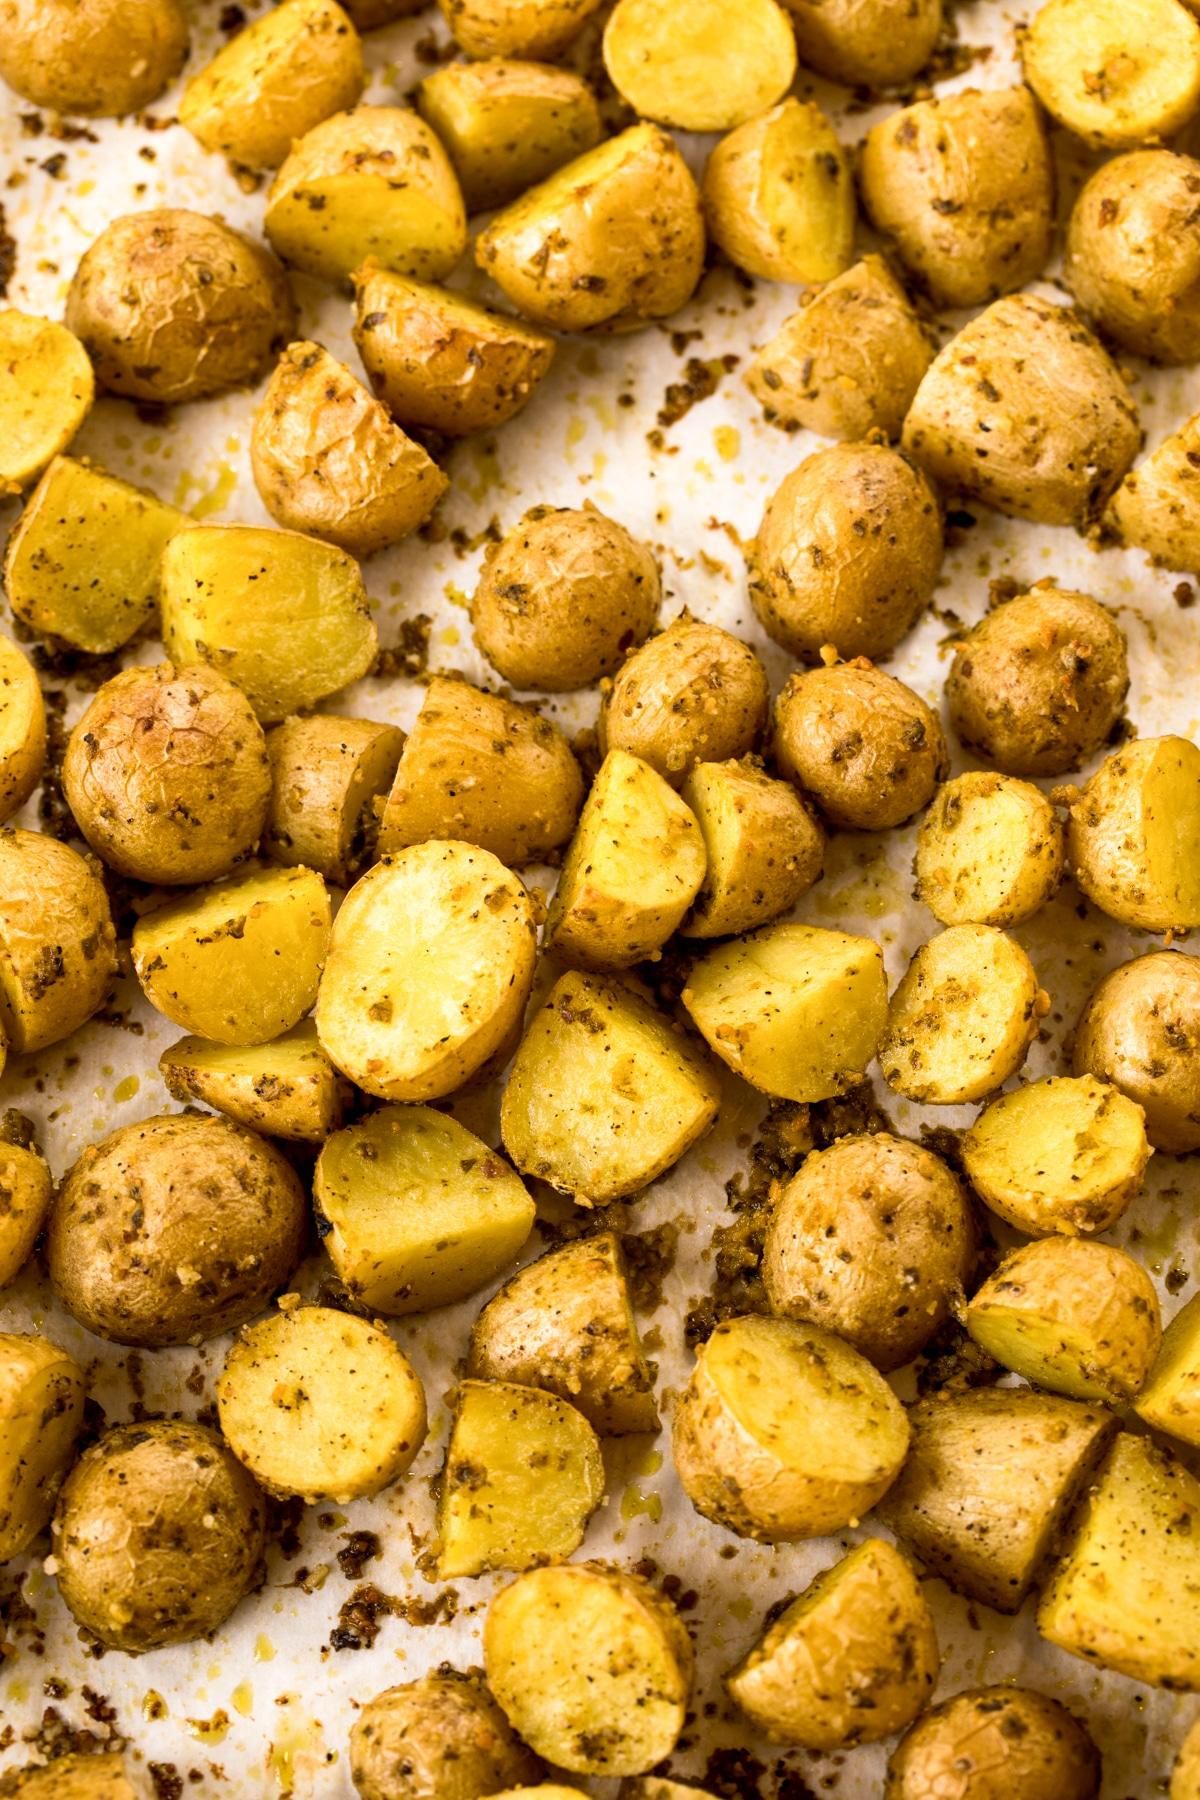 Easy 2-Ingredient Oven Roasted Potatoes Recipe #ASpicyPerspective #potato #glutenfree #side #sidedish #roasted